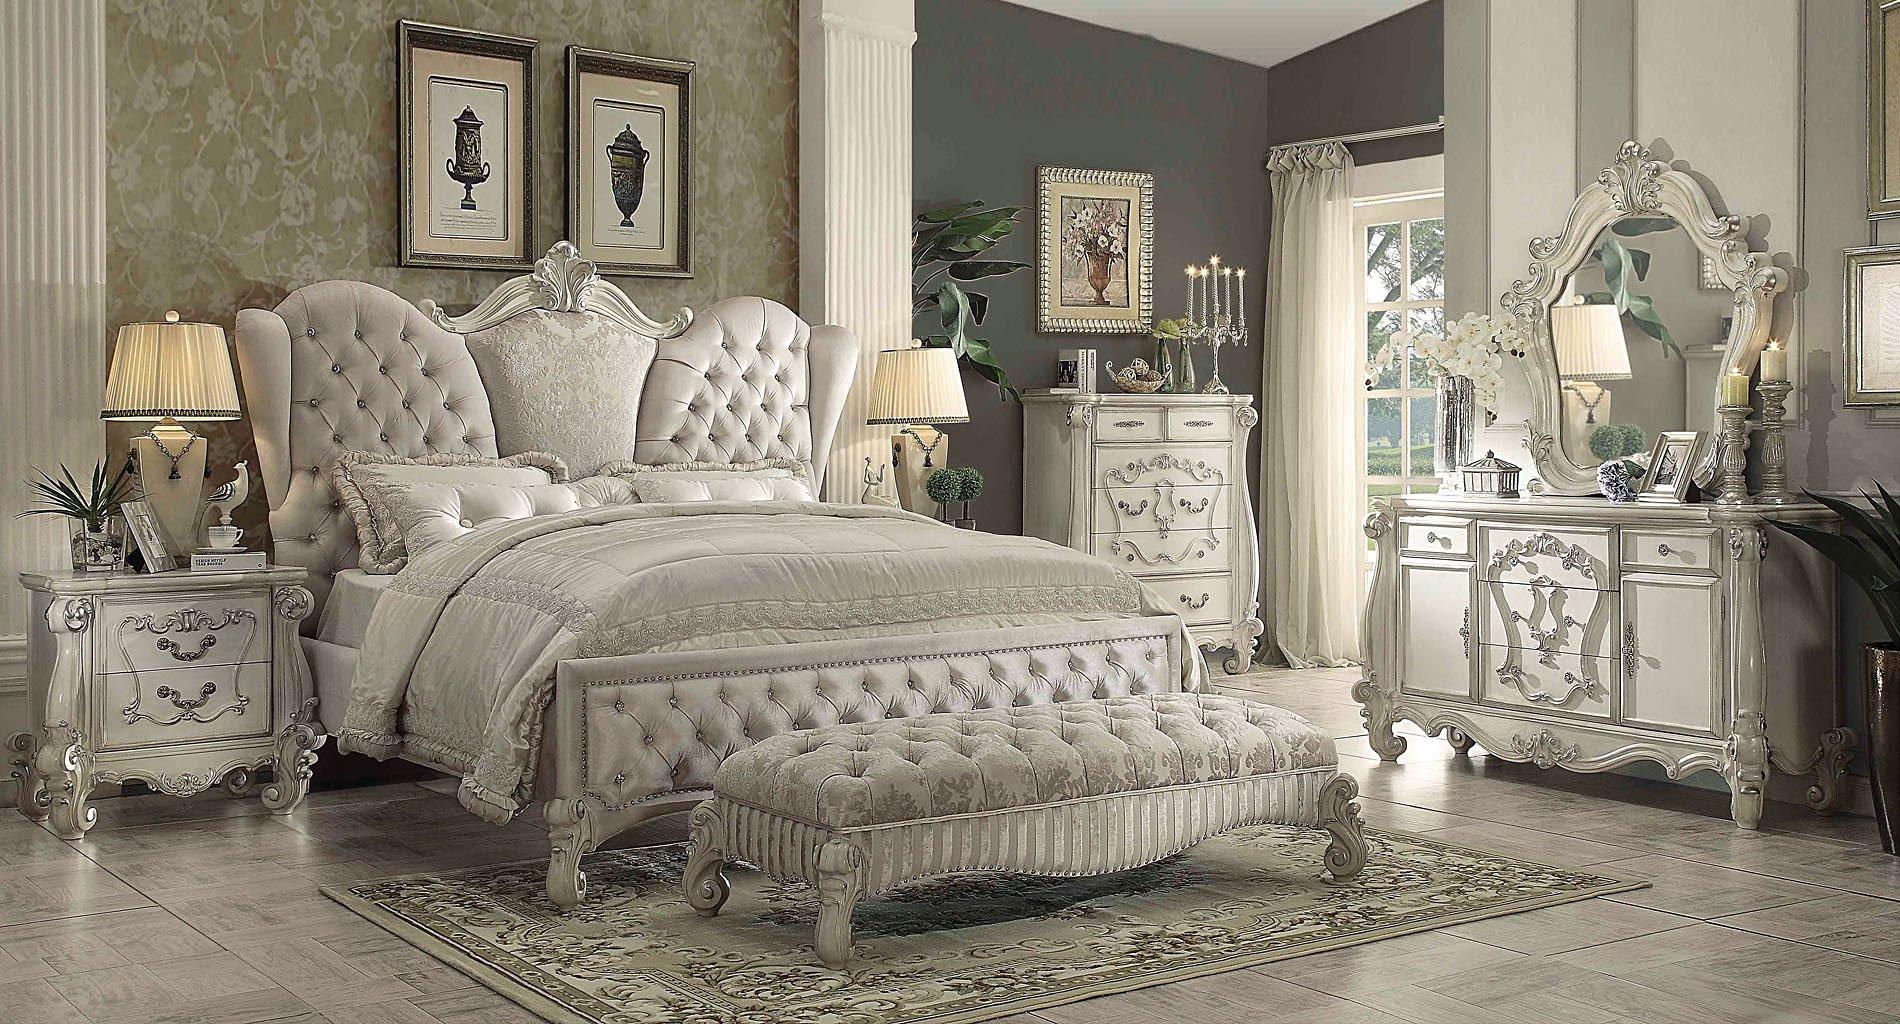 versailles upholstered bedroom set w ivory bed